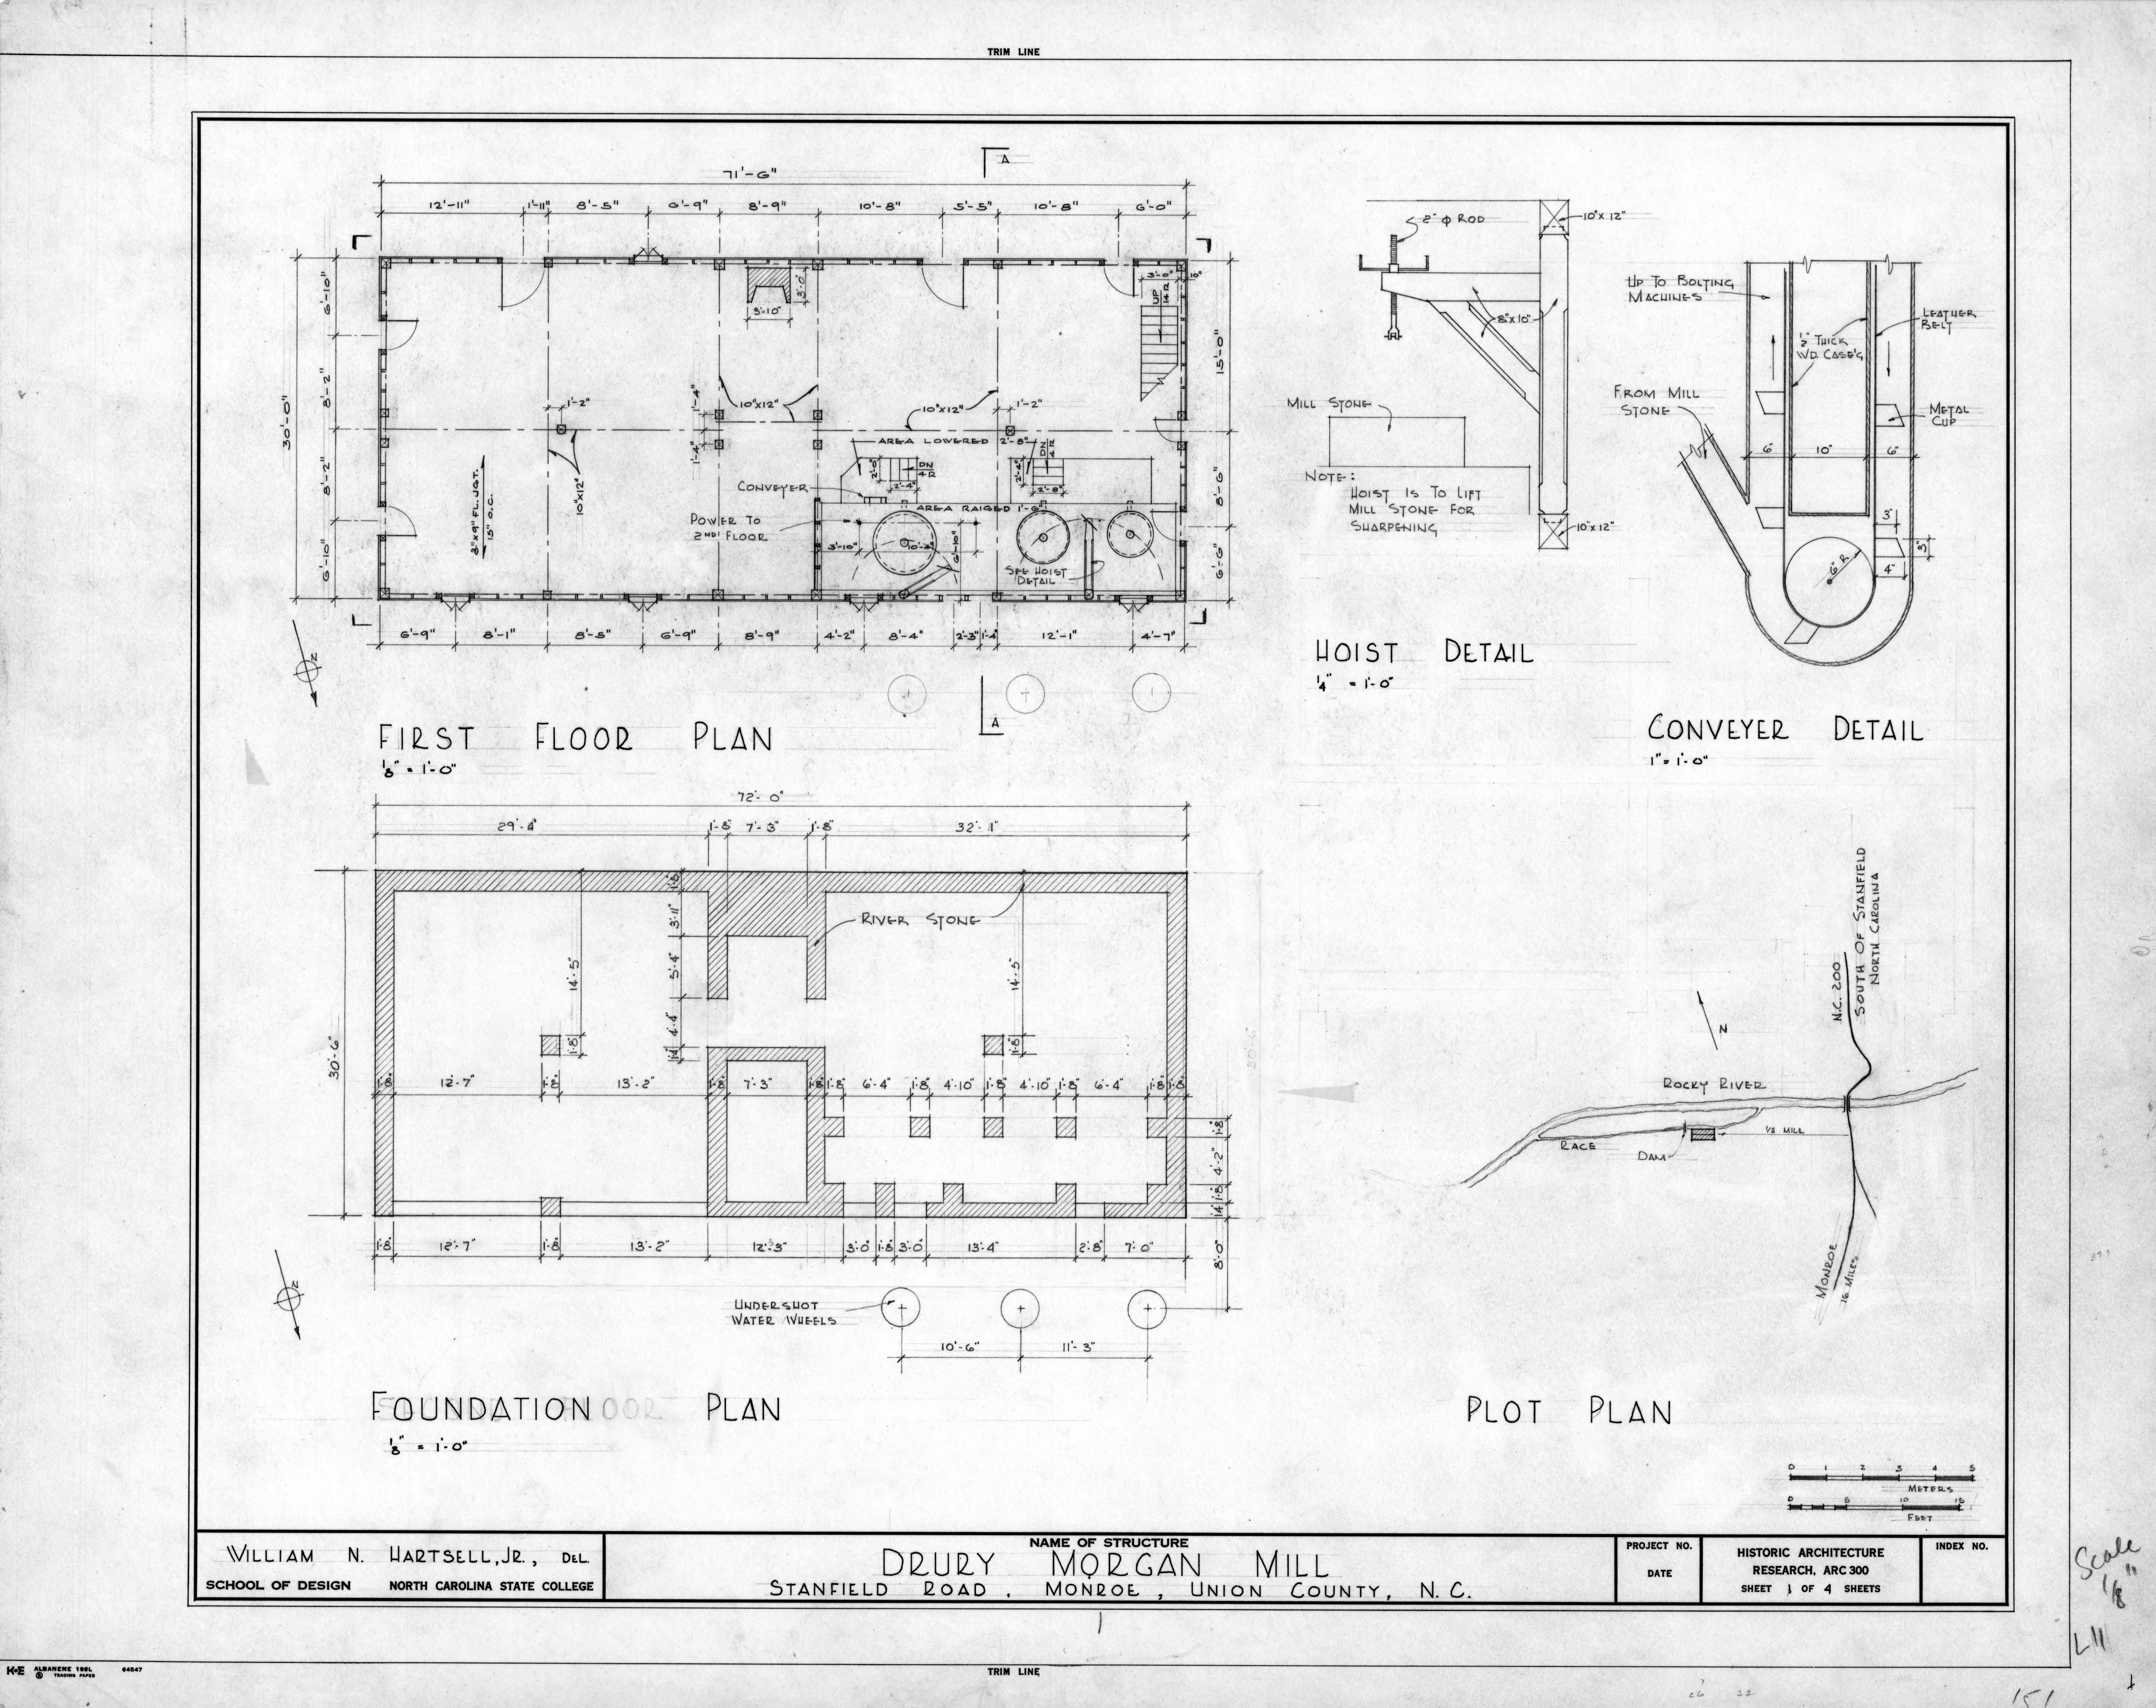 Floor plan foundation plan site plan and detail drury for Foundation blueprints